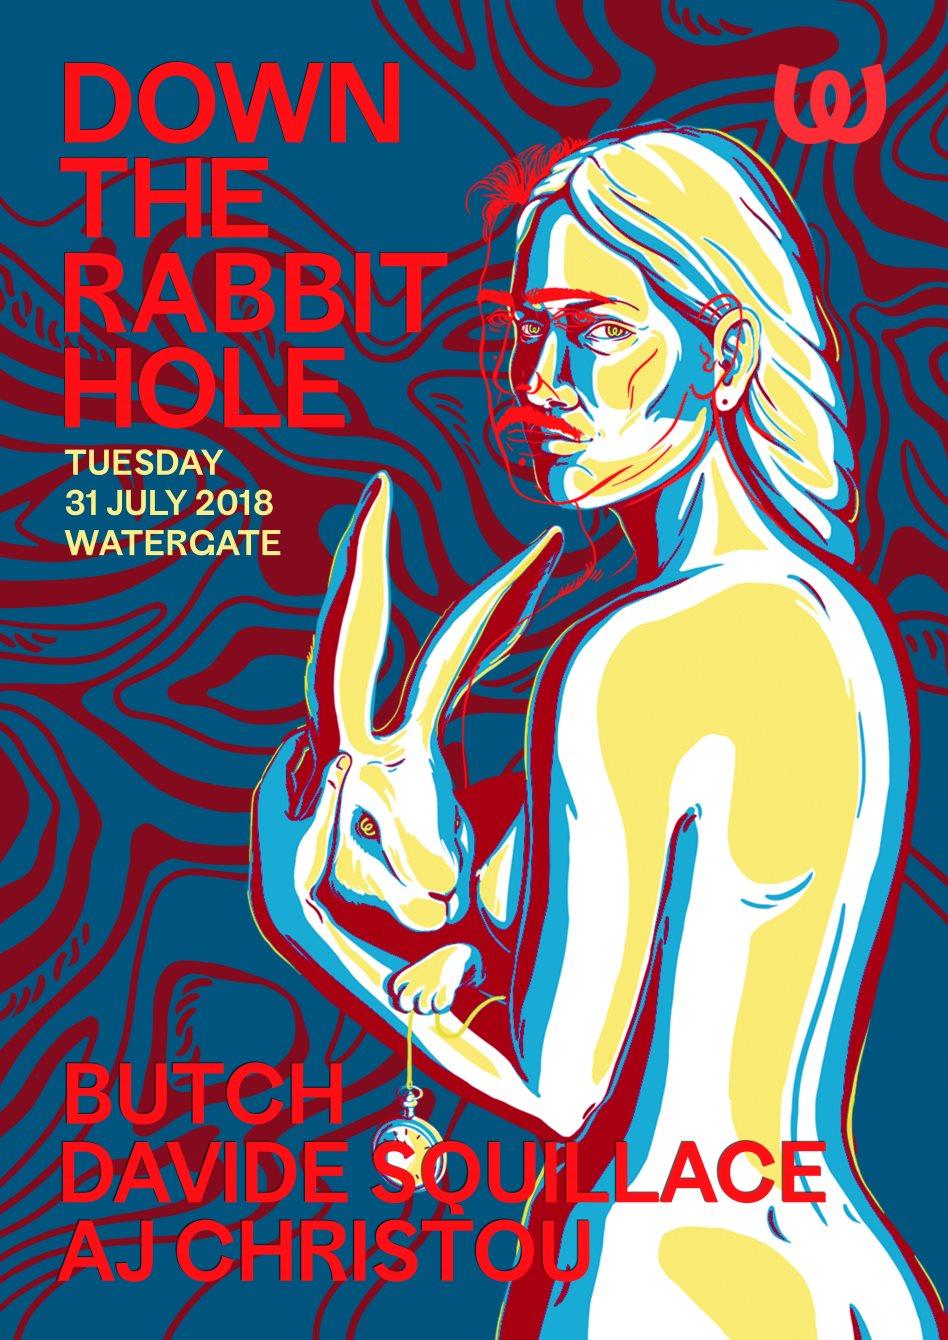 Down The Rabbit Hole: Butch, Davide Squillace, AJ Christou - Flyer front